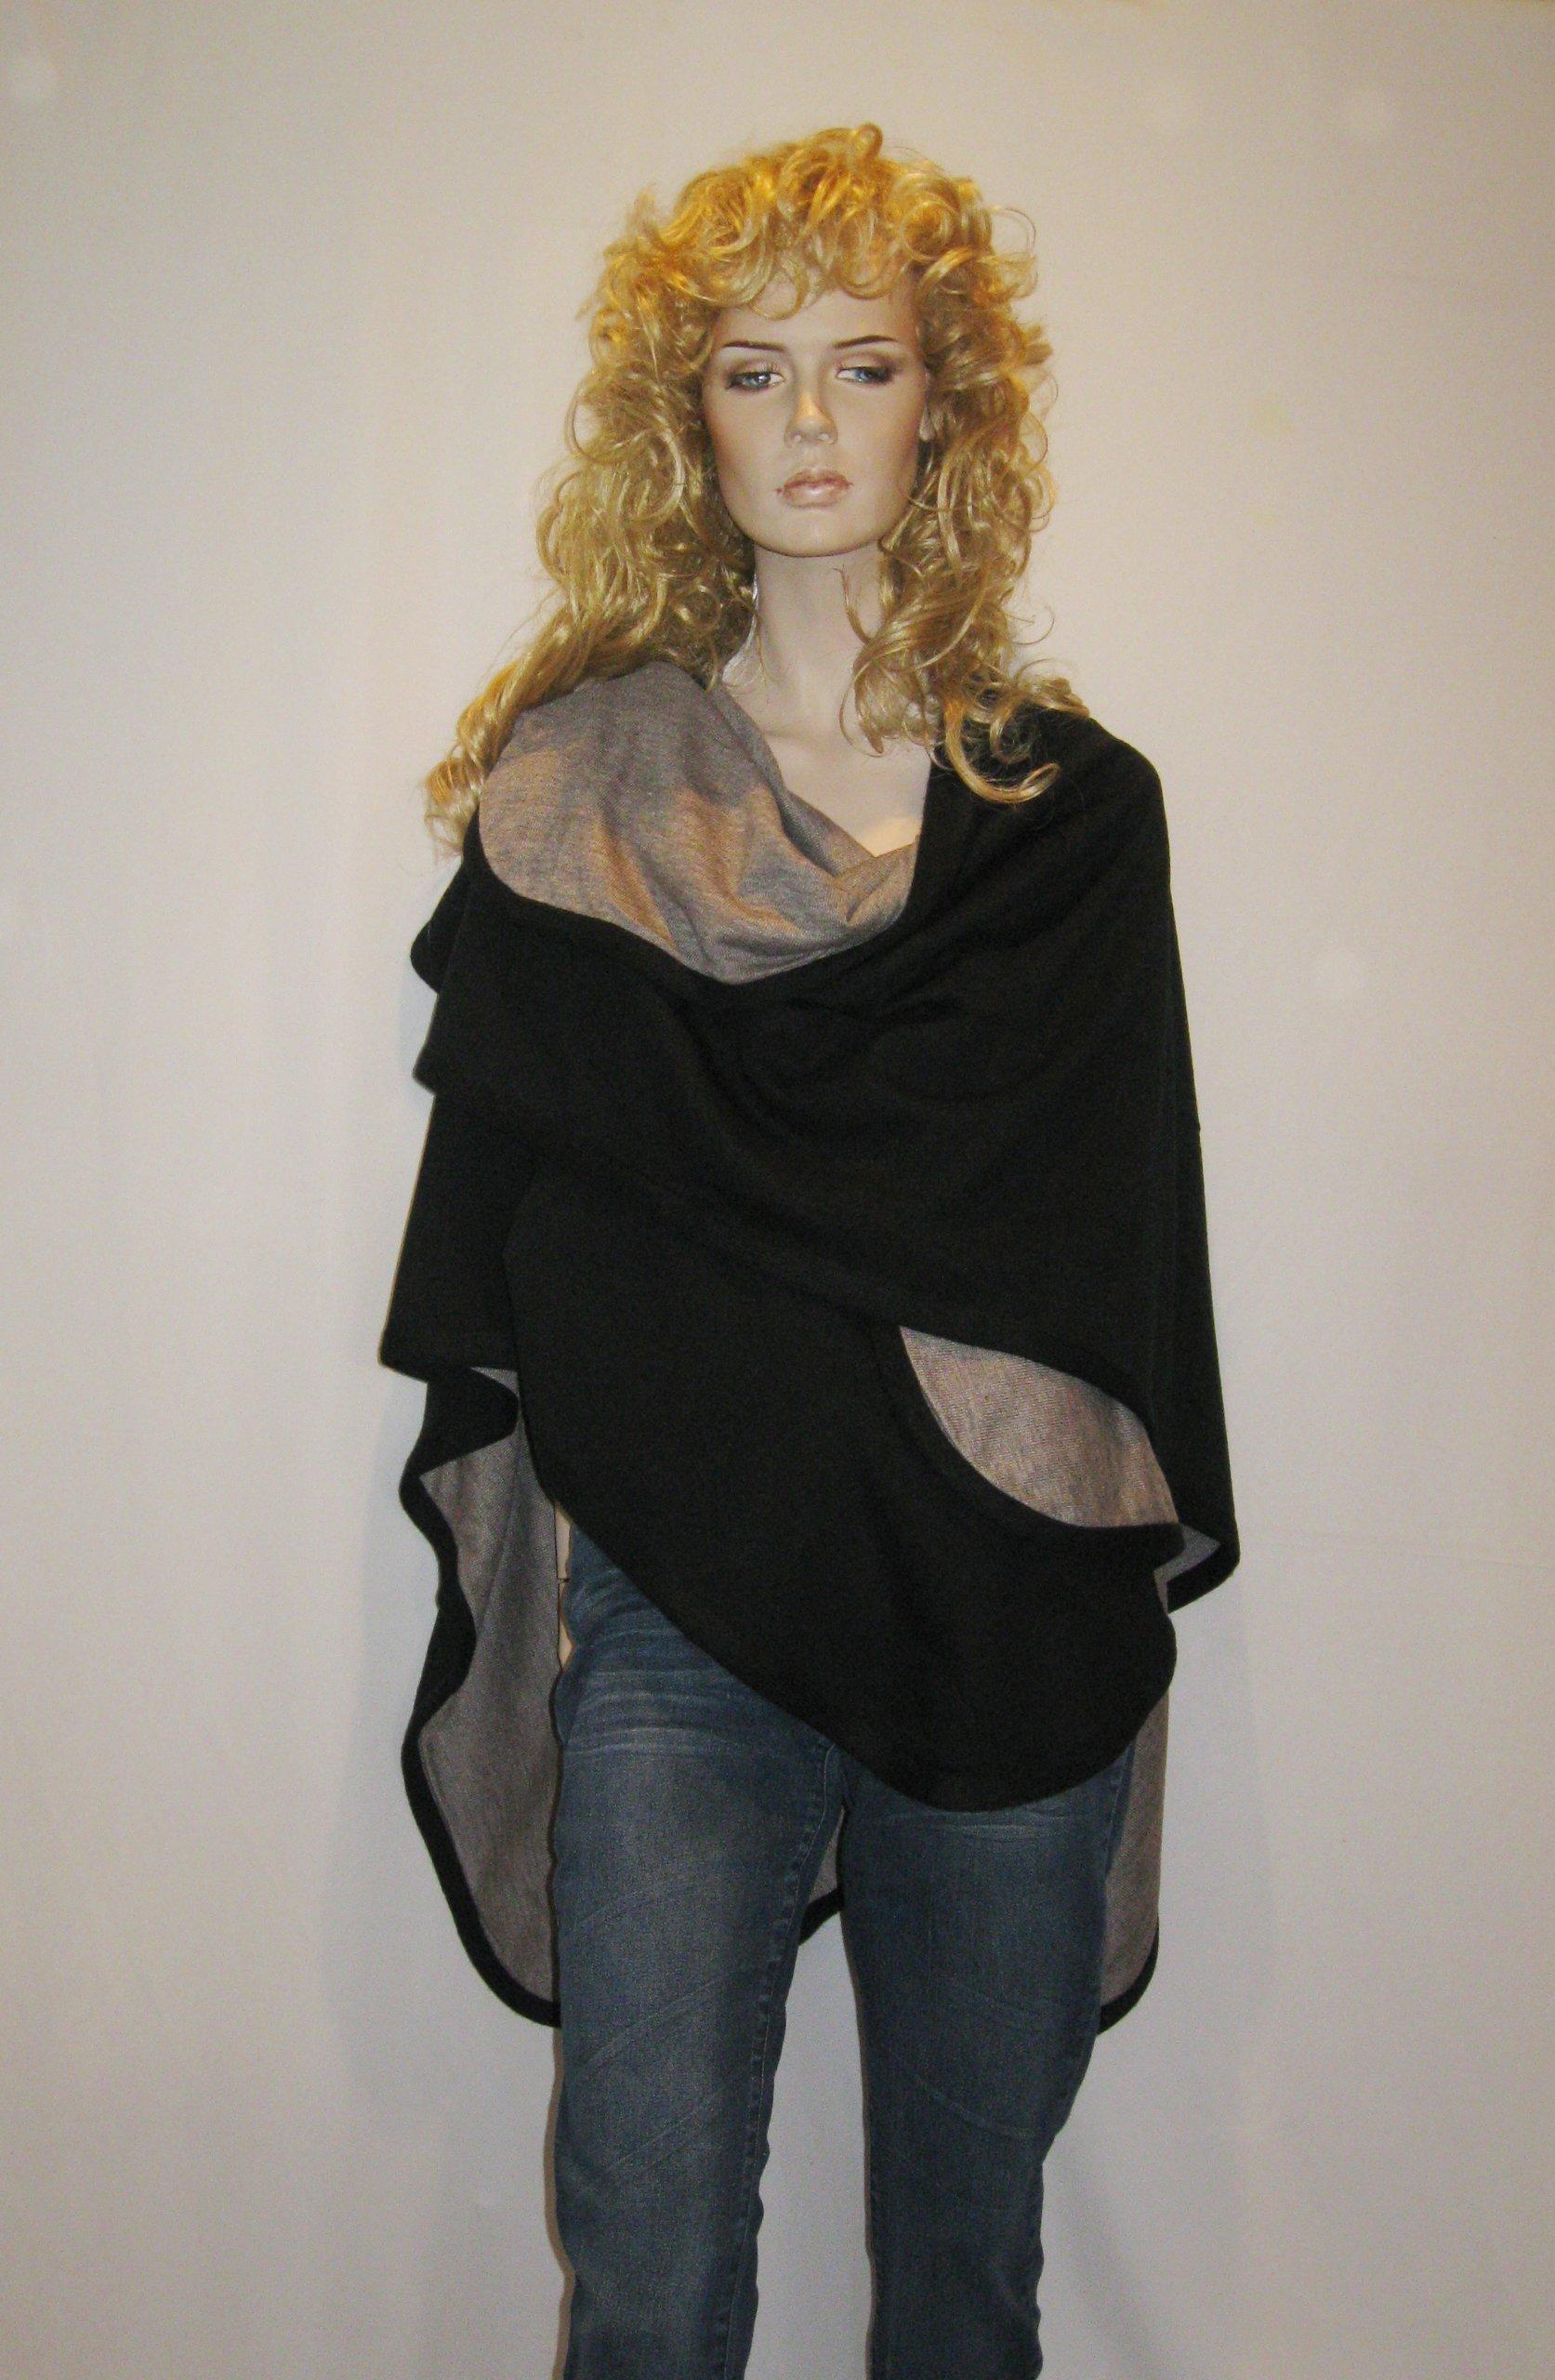 Cashmere Pashmina Group- Cape Woolen Reversible Ruana Knitted Poncho Shawl Cardigans Sweater Coat (Black/ Stone) by Cashmere Pashmina Group (Image #9)